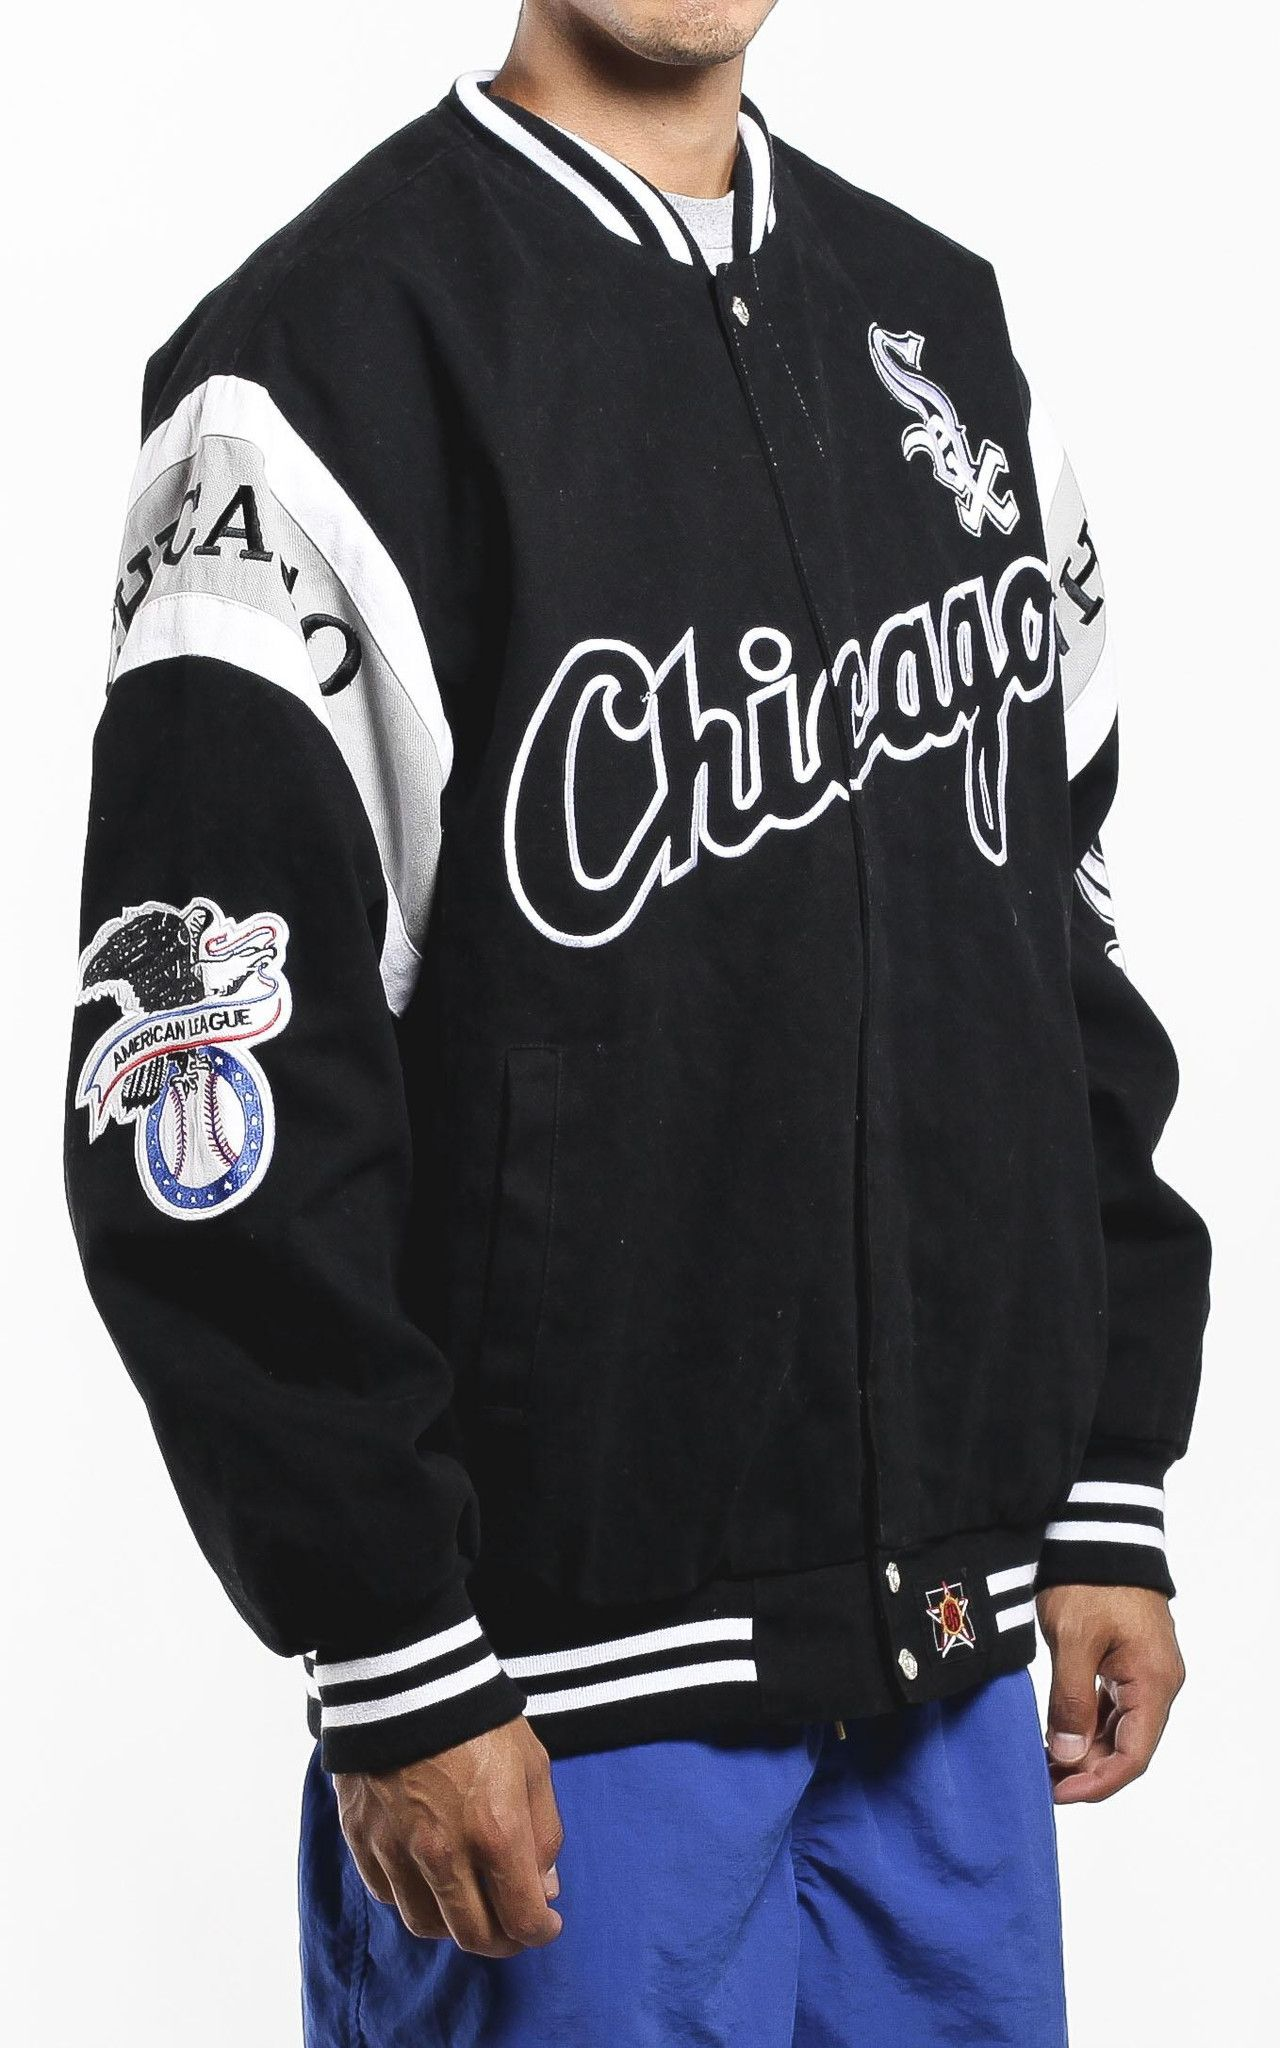 Vintage Chicago White Sox Jacket Sz Xl Chicago White Sox White Sock Jackets [ 2048 x 1280 Pixel ]